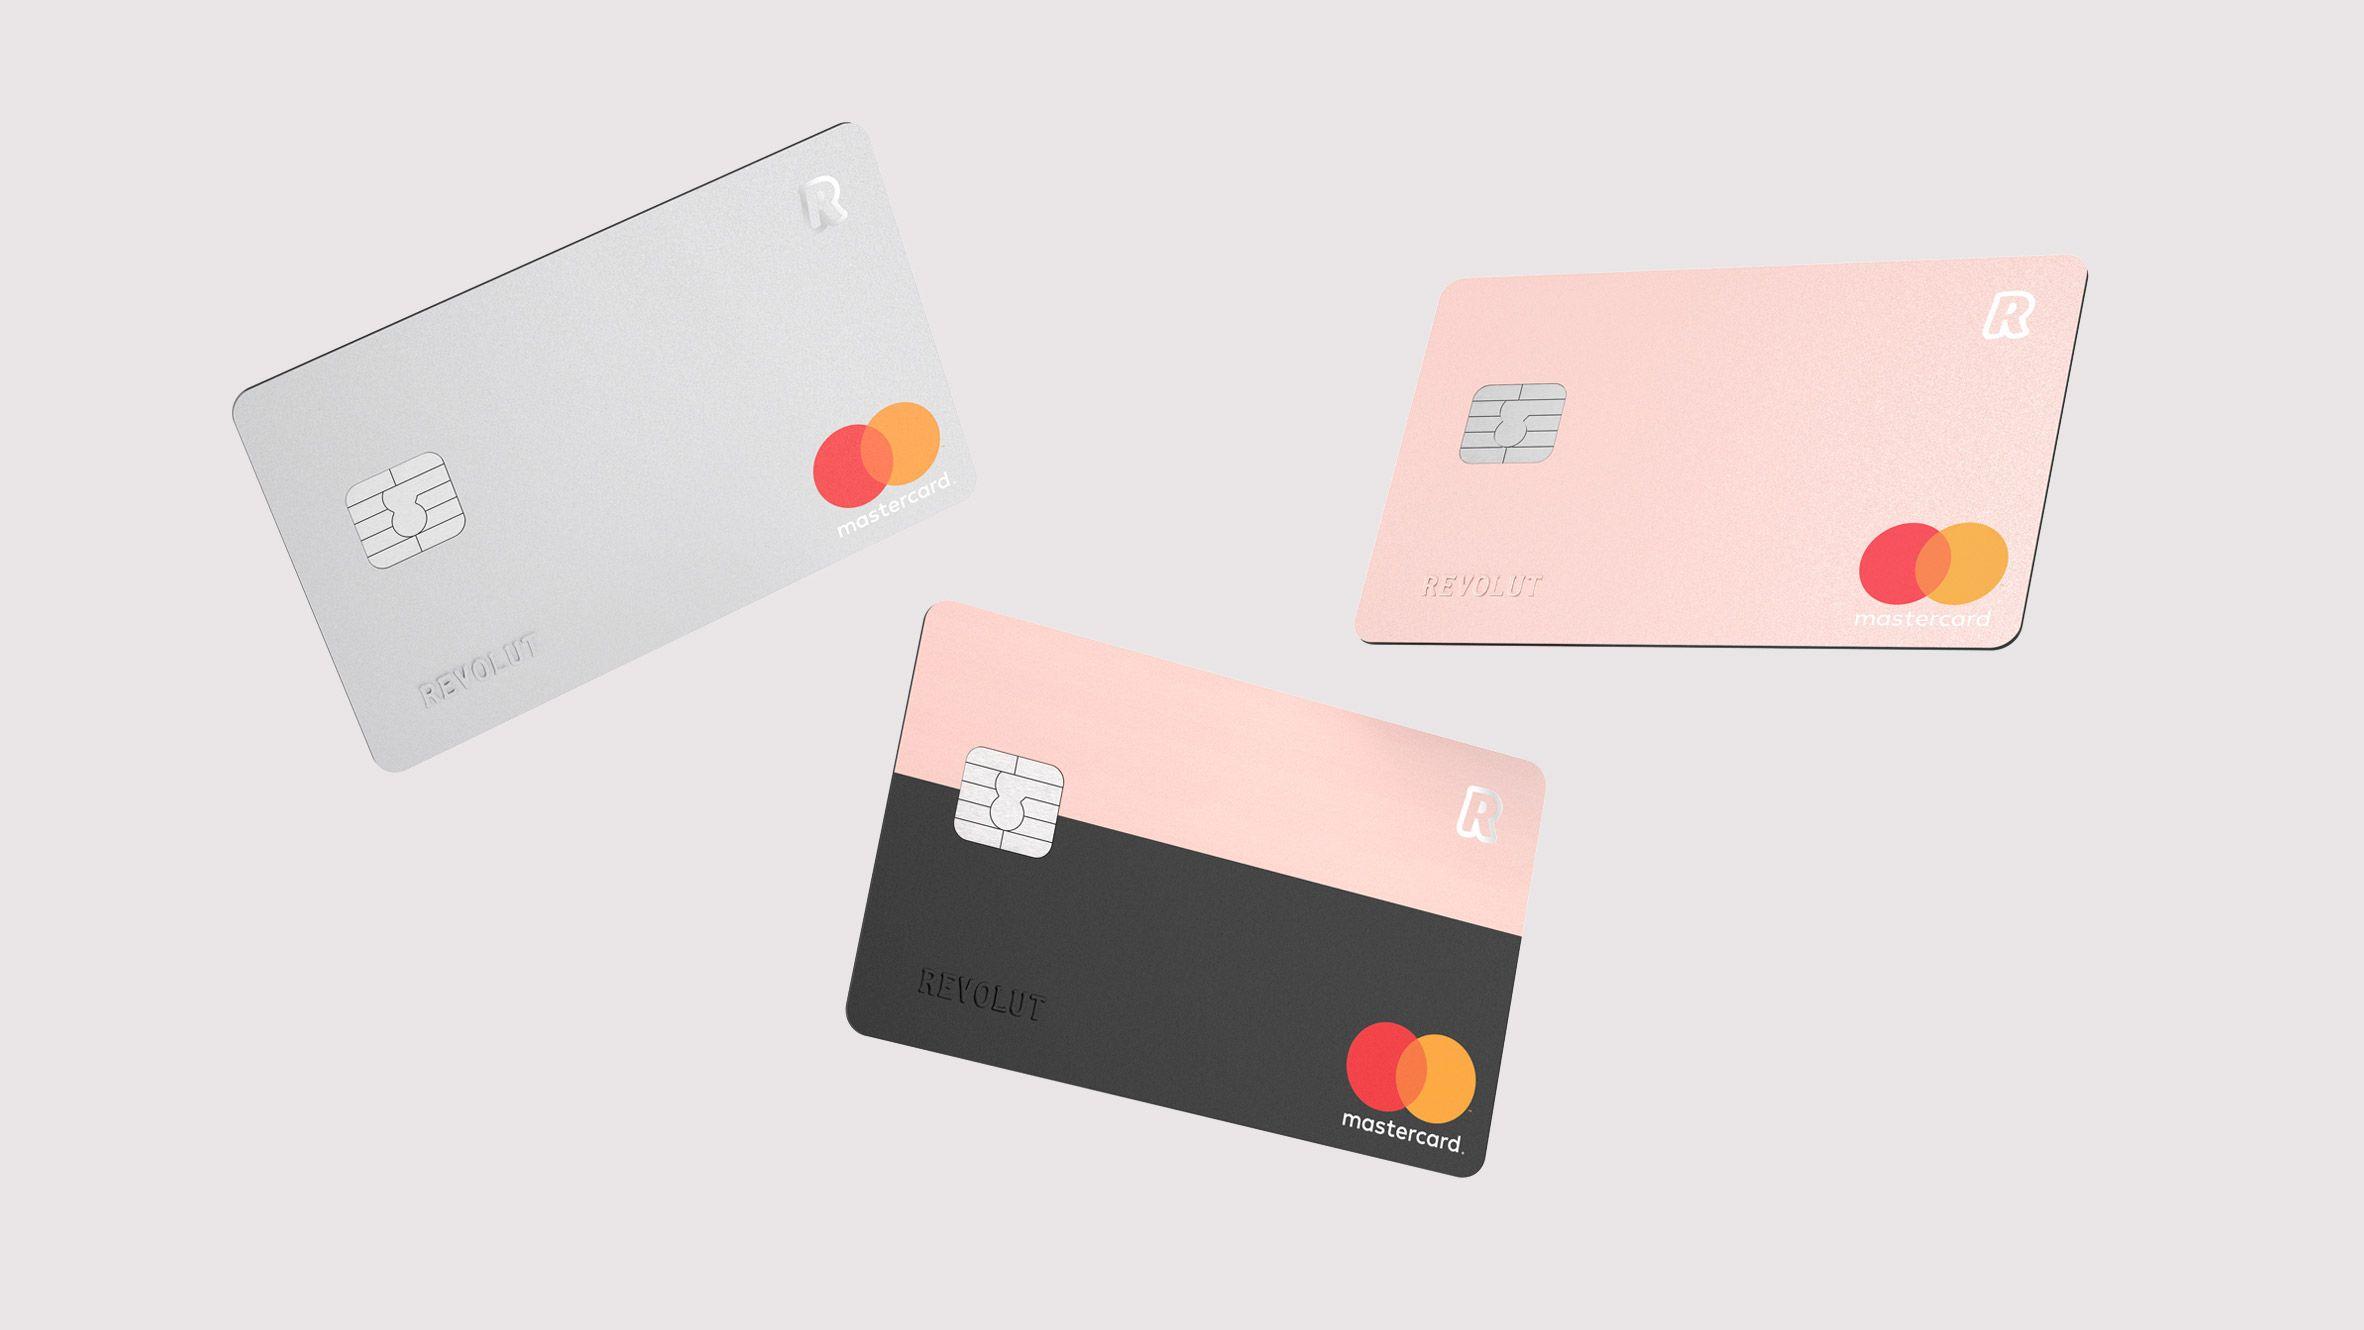 Blond Creates Stripped Back Bank Card For Financial Services Start Up Revolut Debit Card Design Credit Card Design Fintech Startups